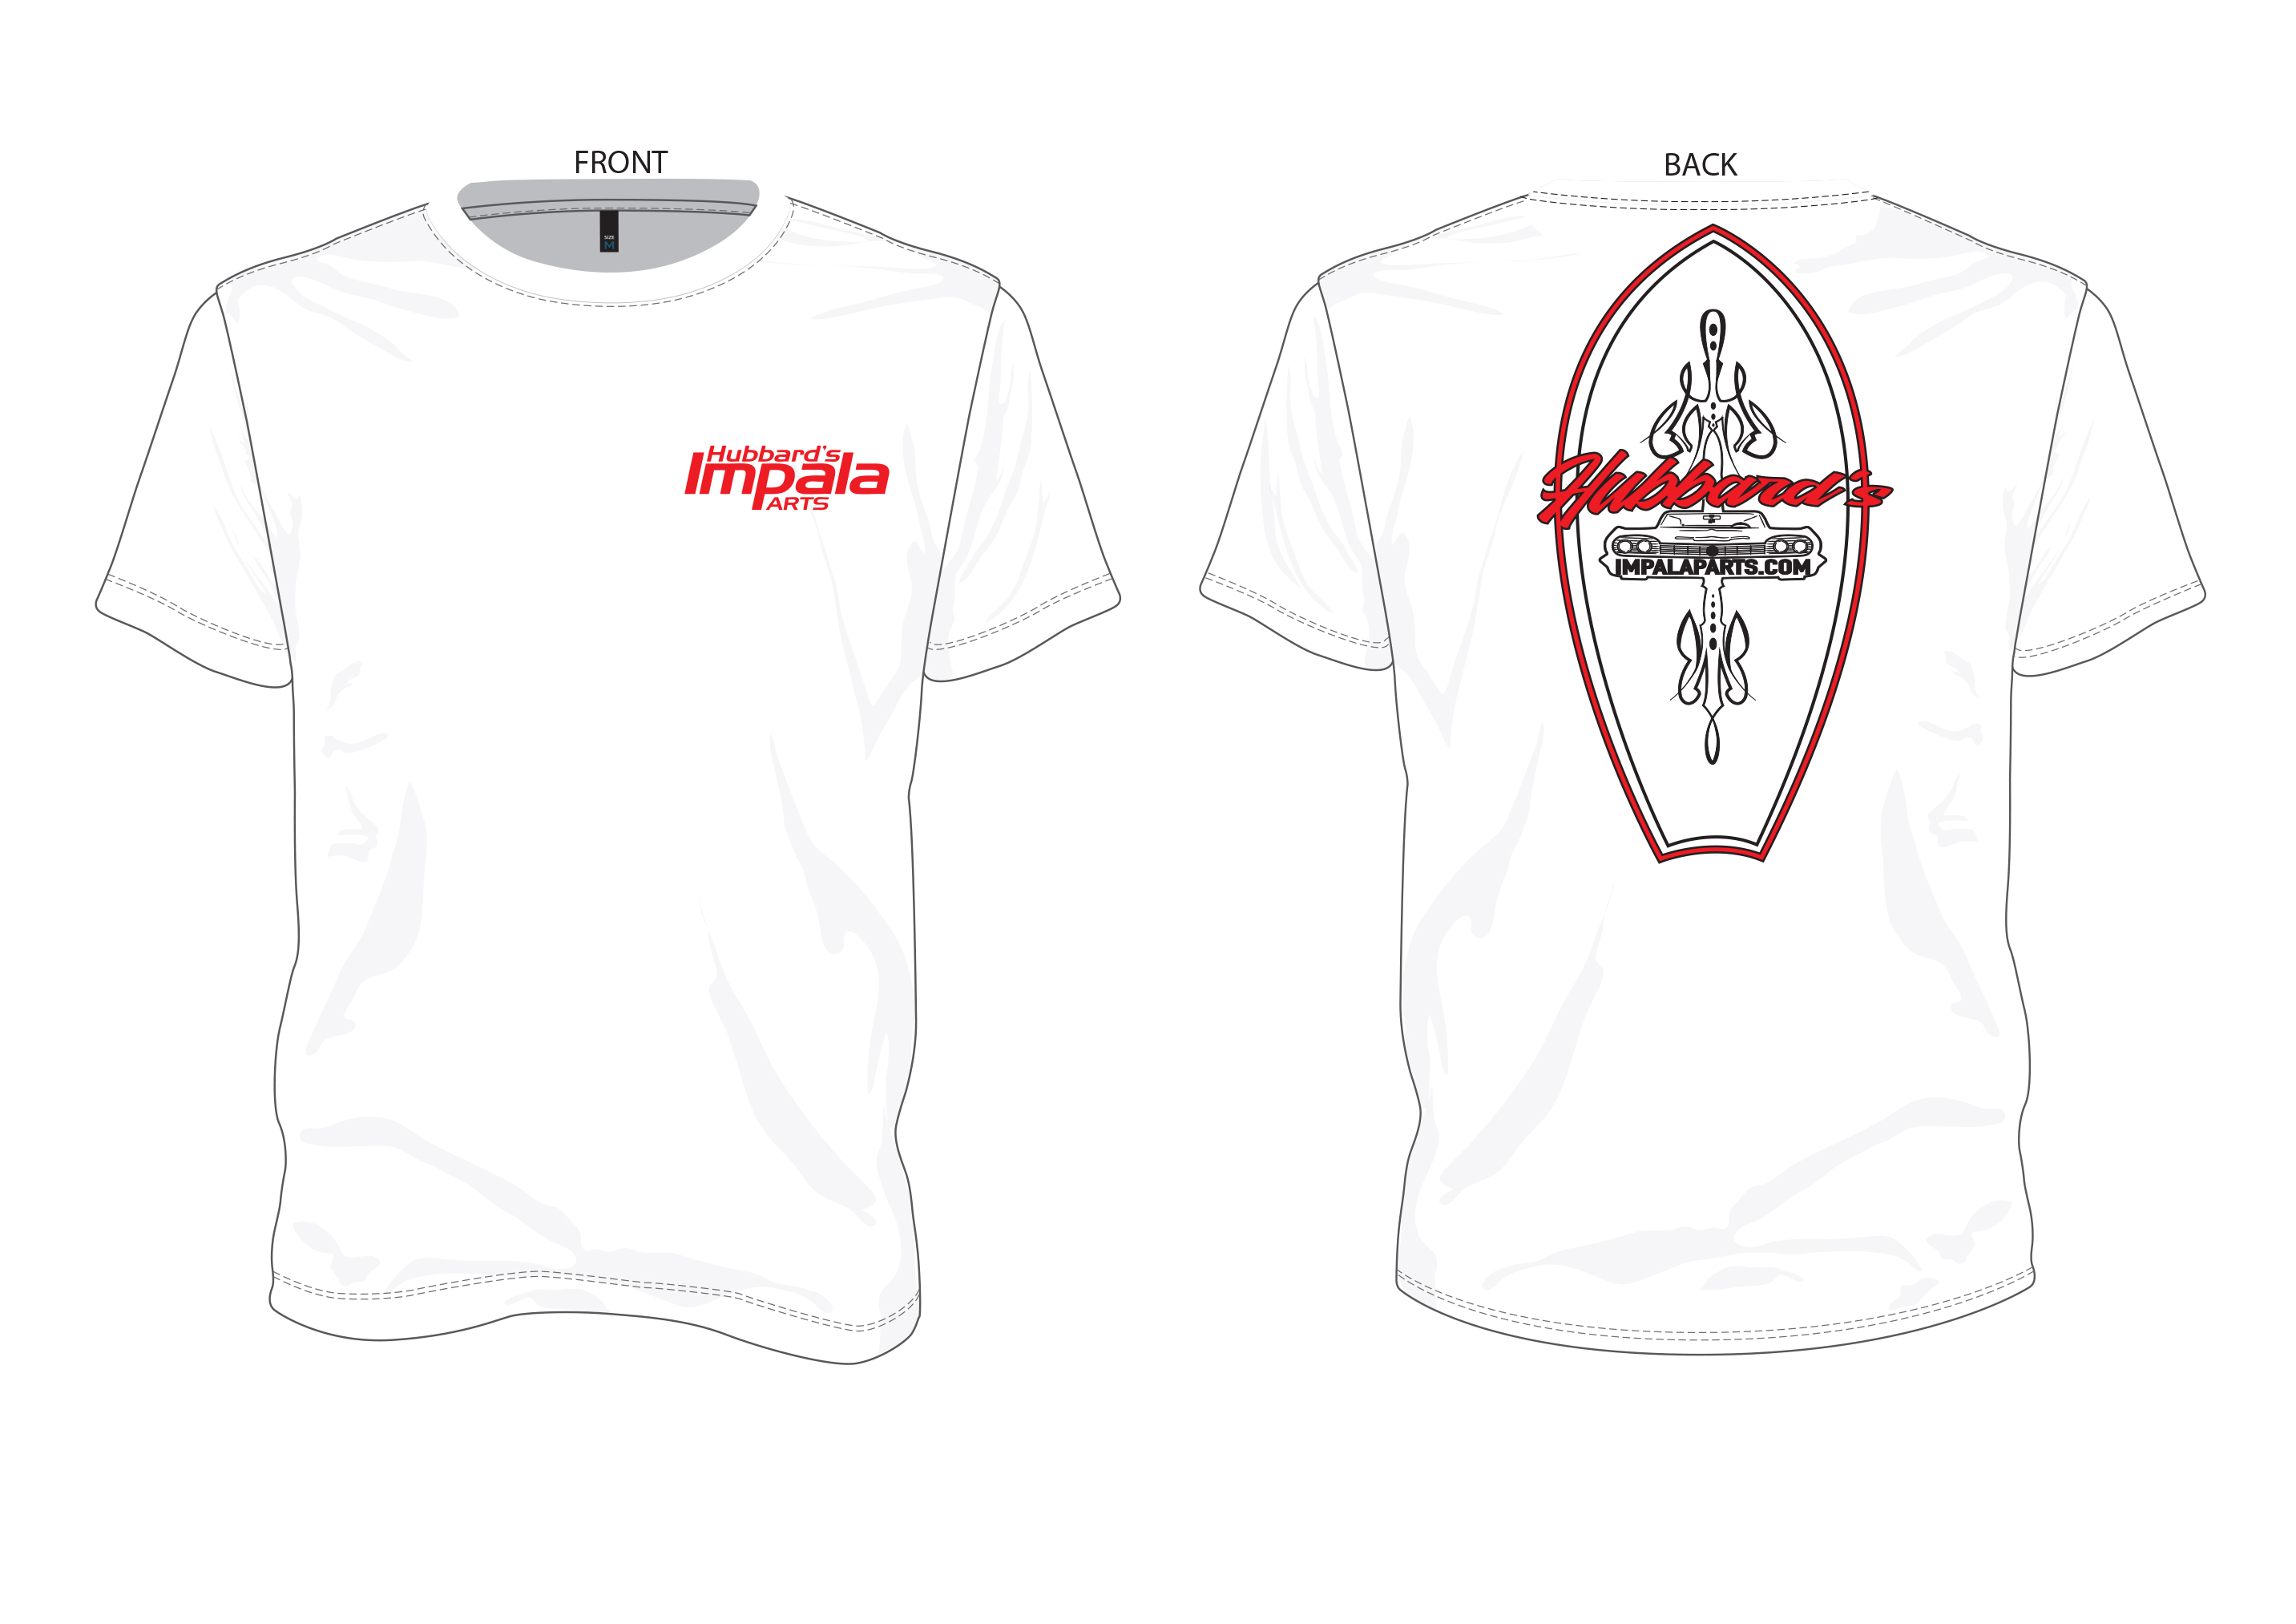 Hubbards Impala Parts T Shirt 2 Xl White